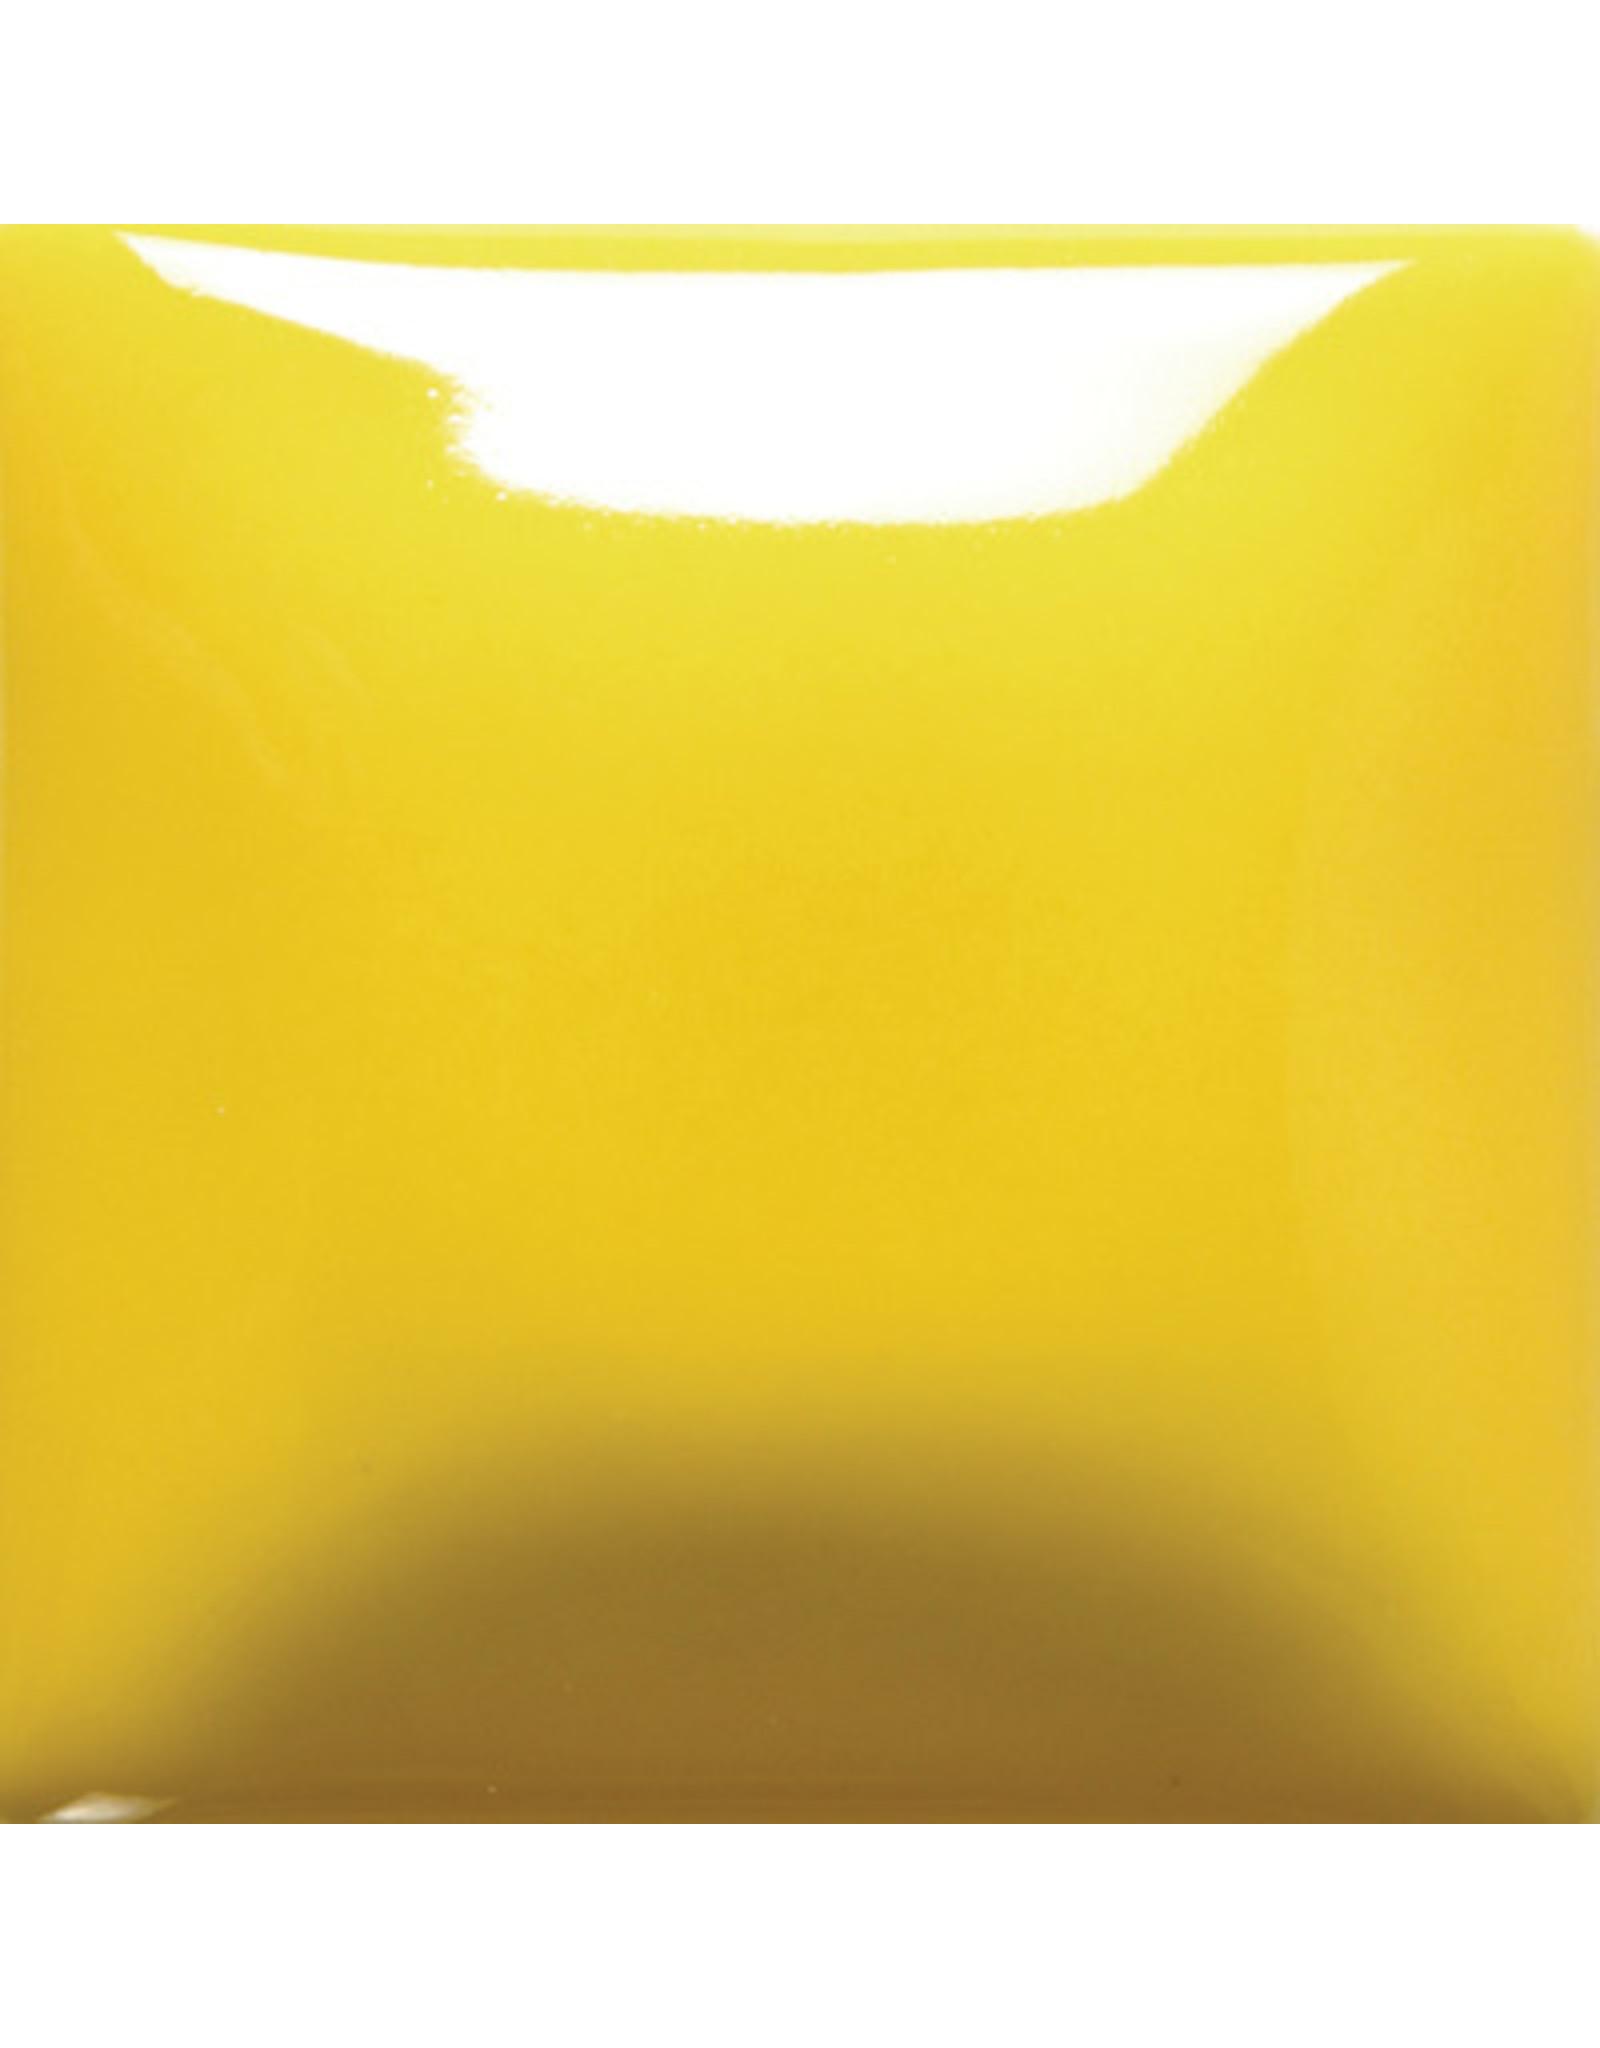 Mayco Mayco Foundations Yellow 118ml